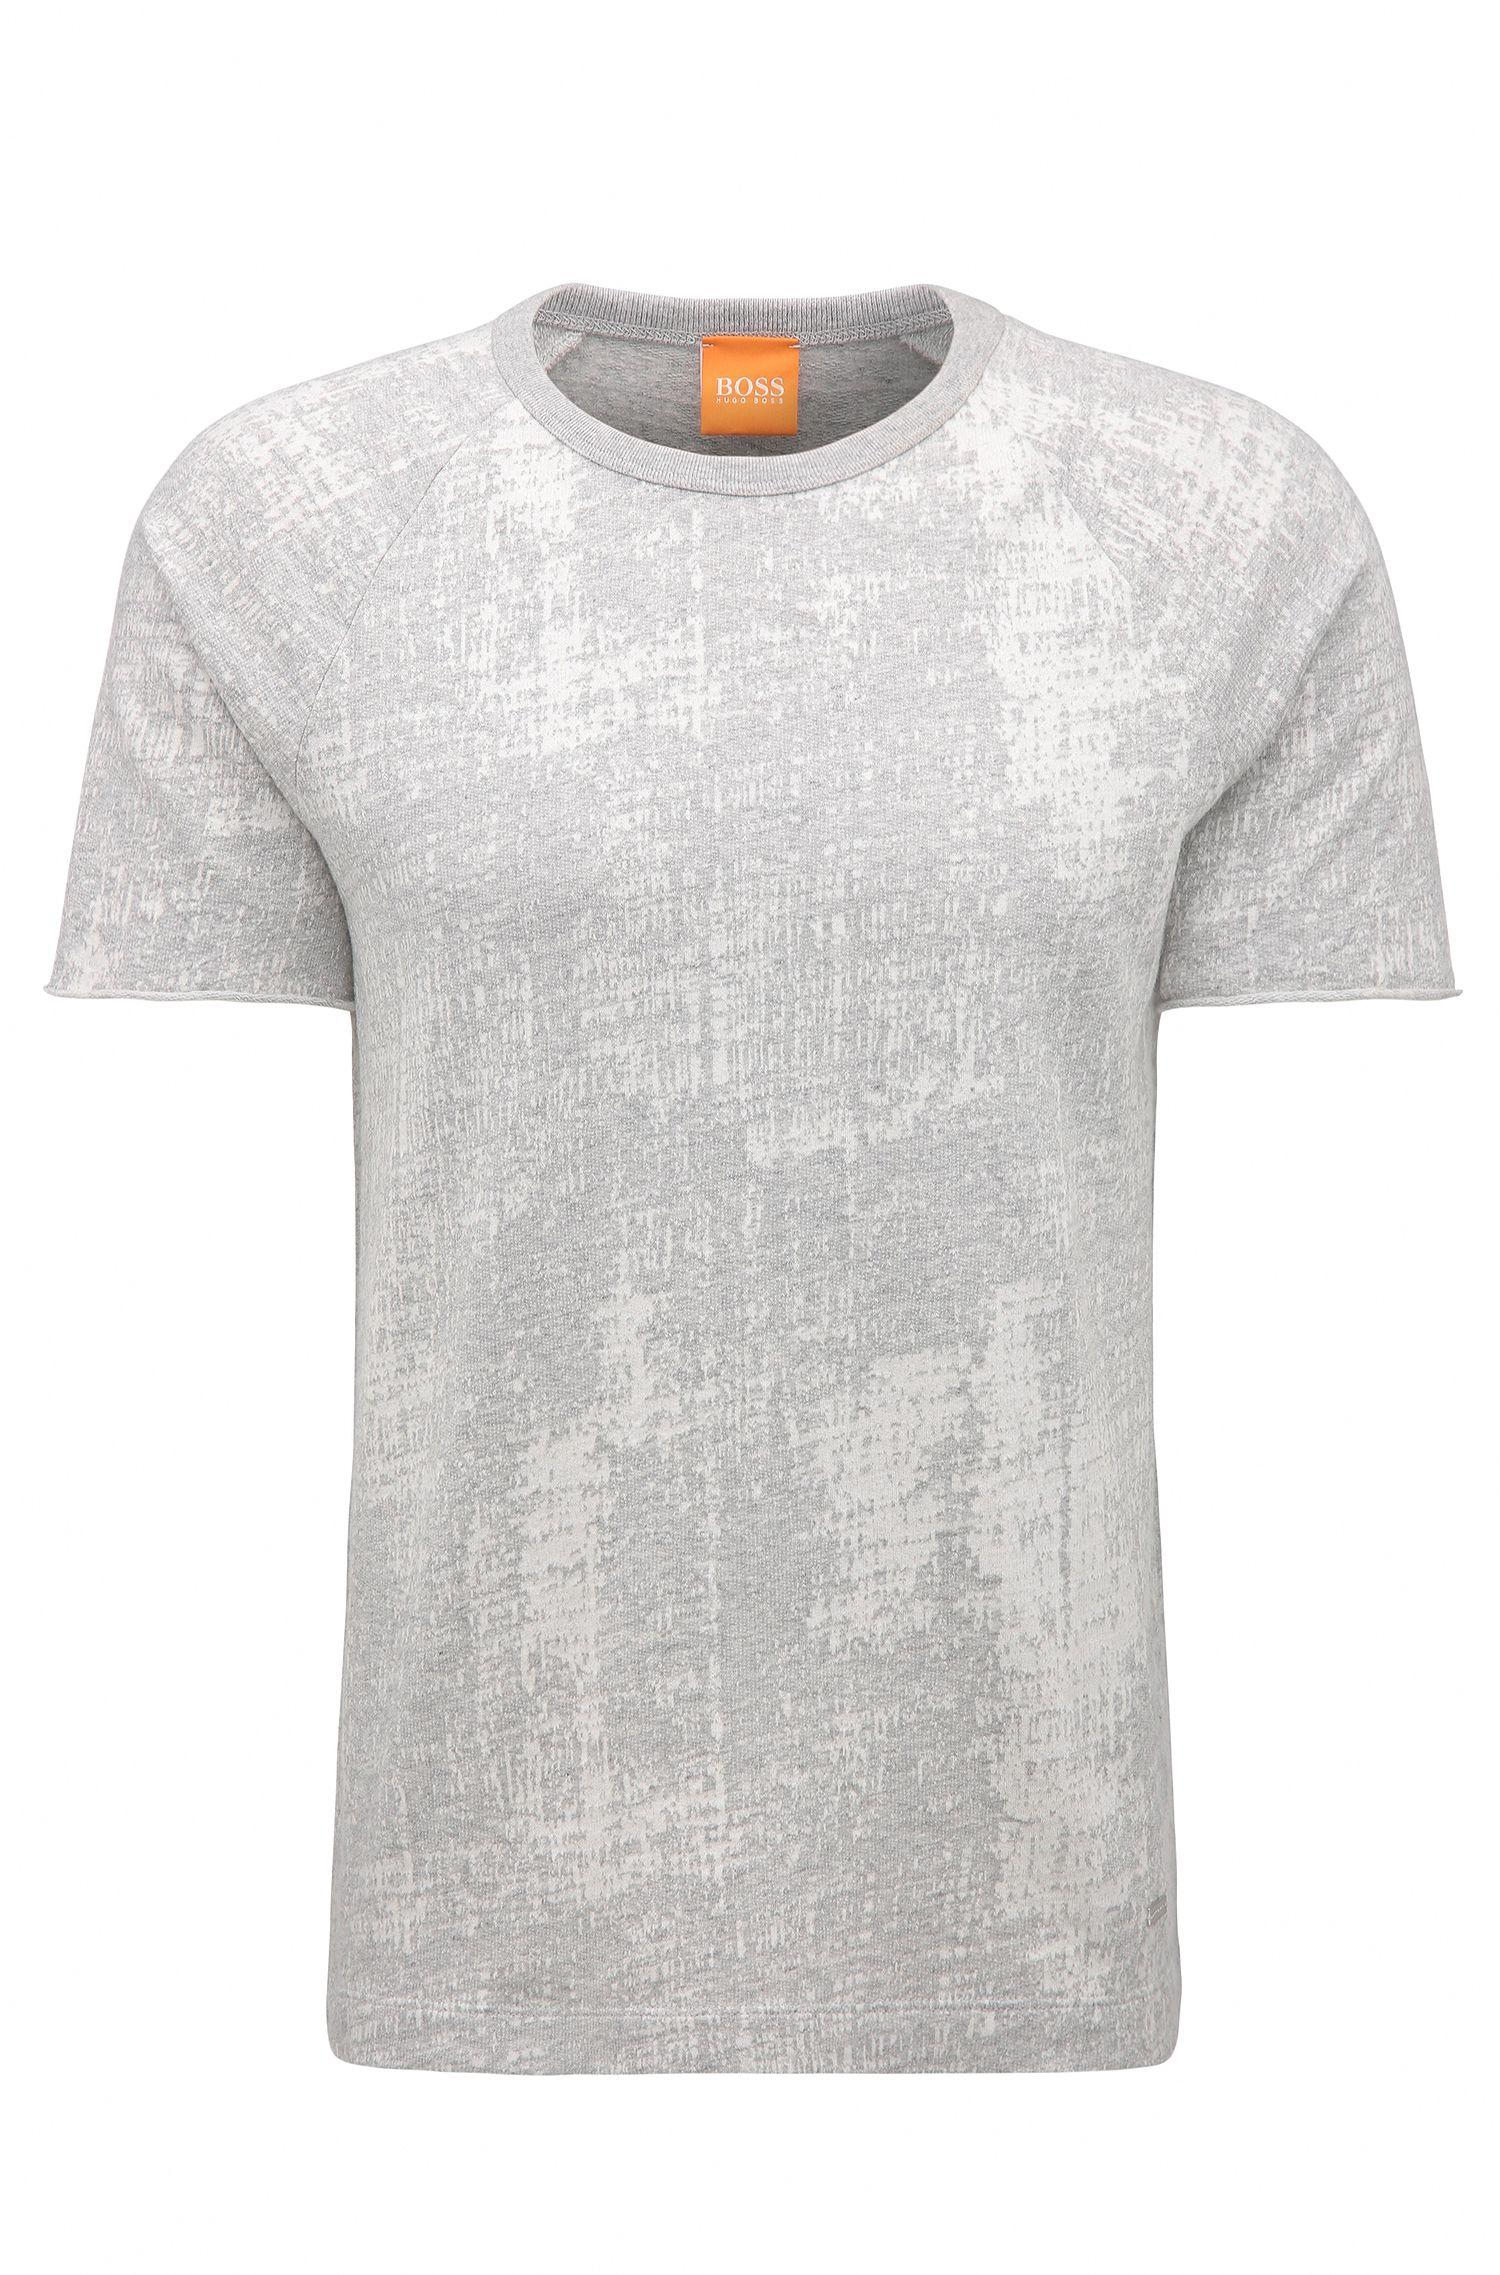 Camiseta relaxed fit en jacquard de algodón